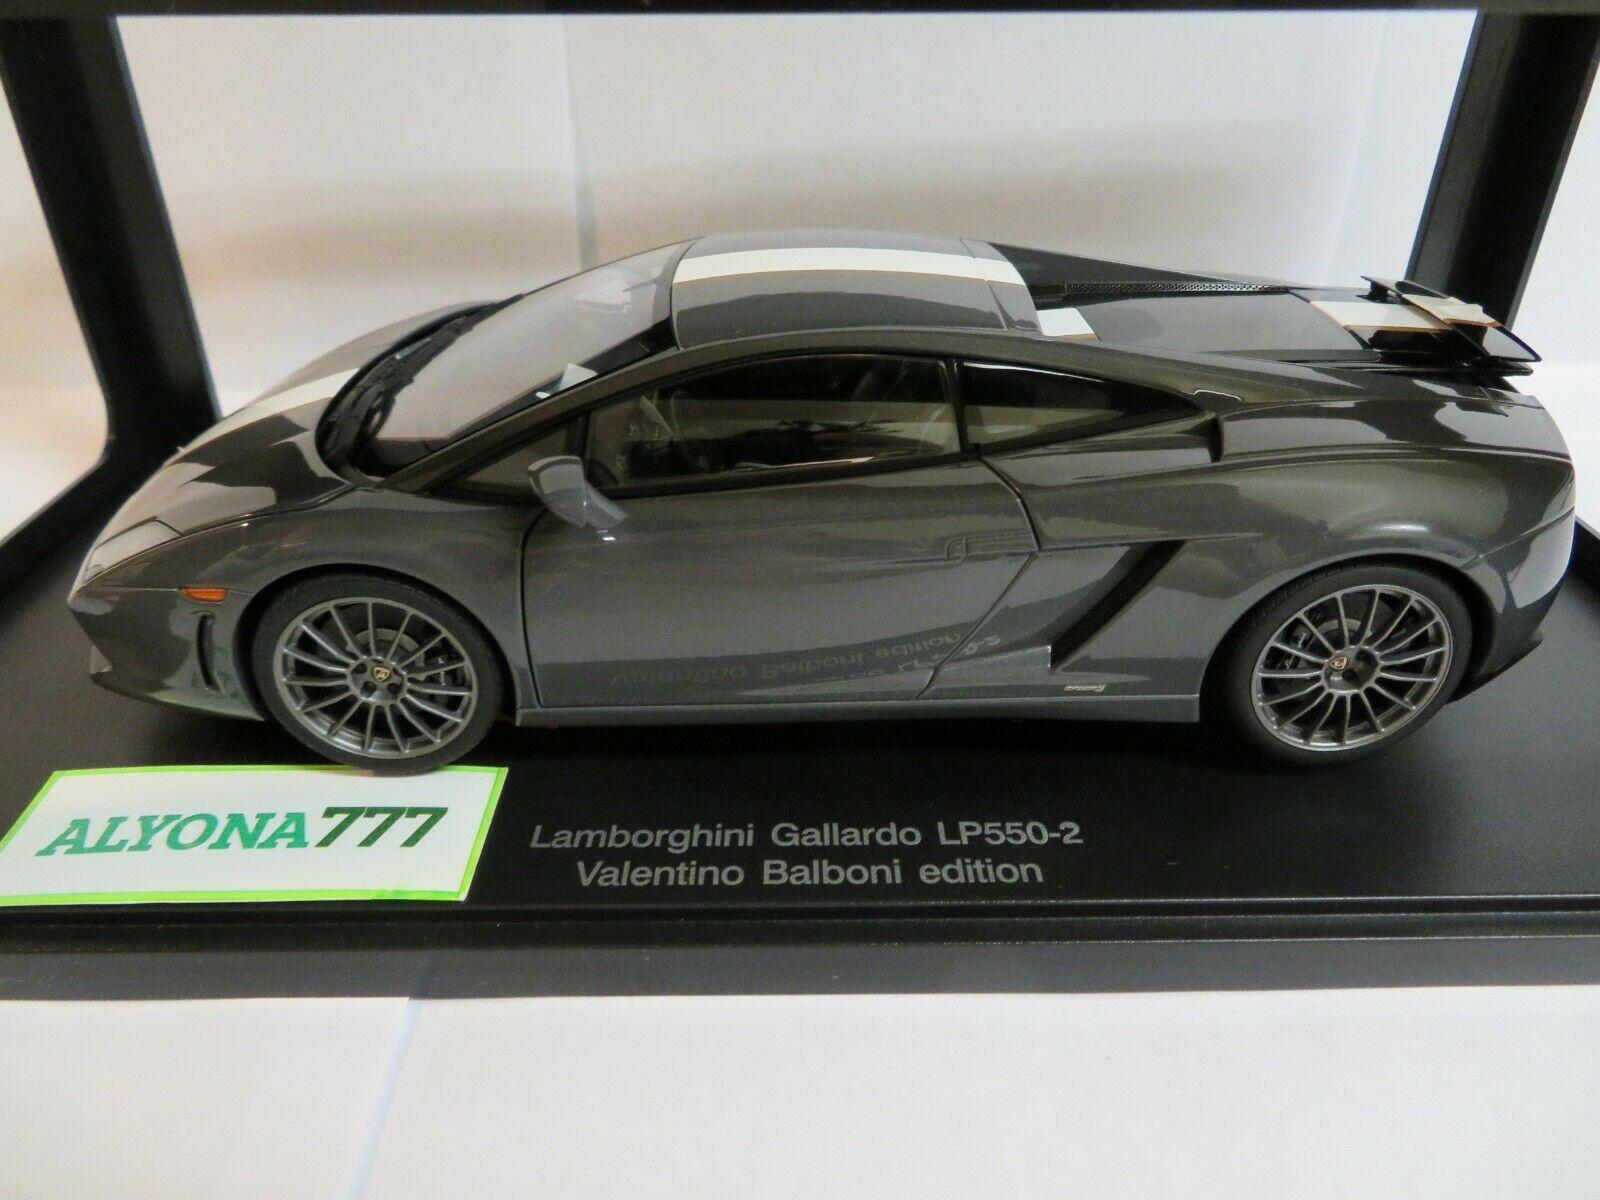 AUTOart 1 18 Lamborghini Gallardo Valentino Balboni Edition grau CAR MODEL NEW